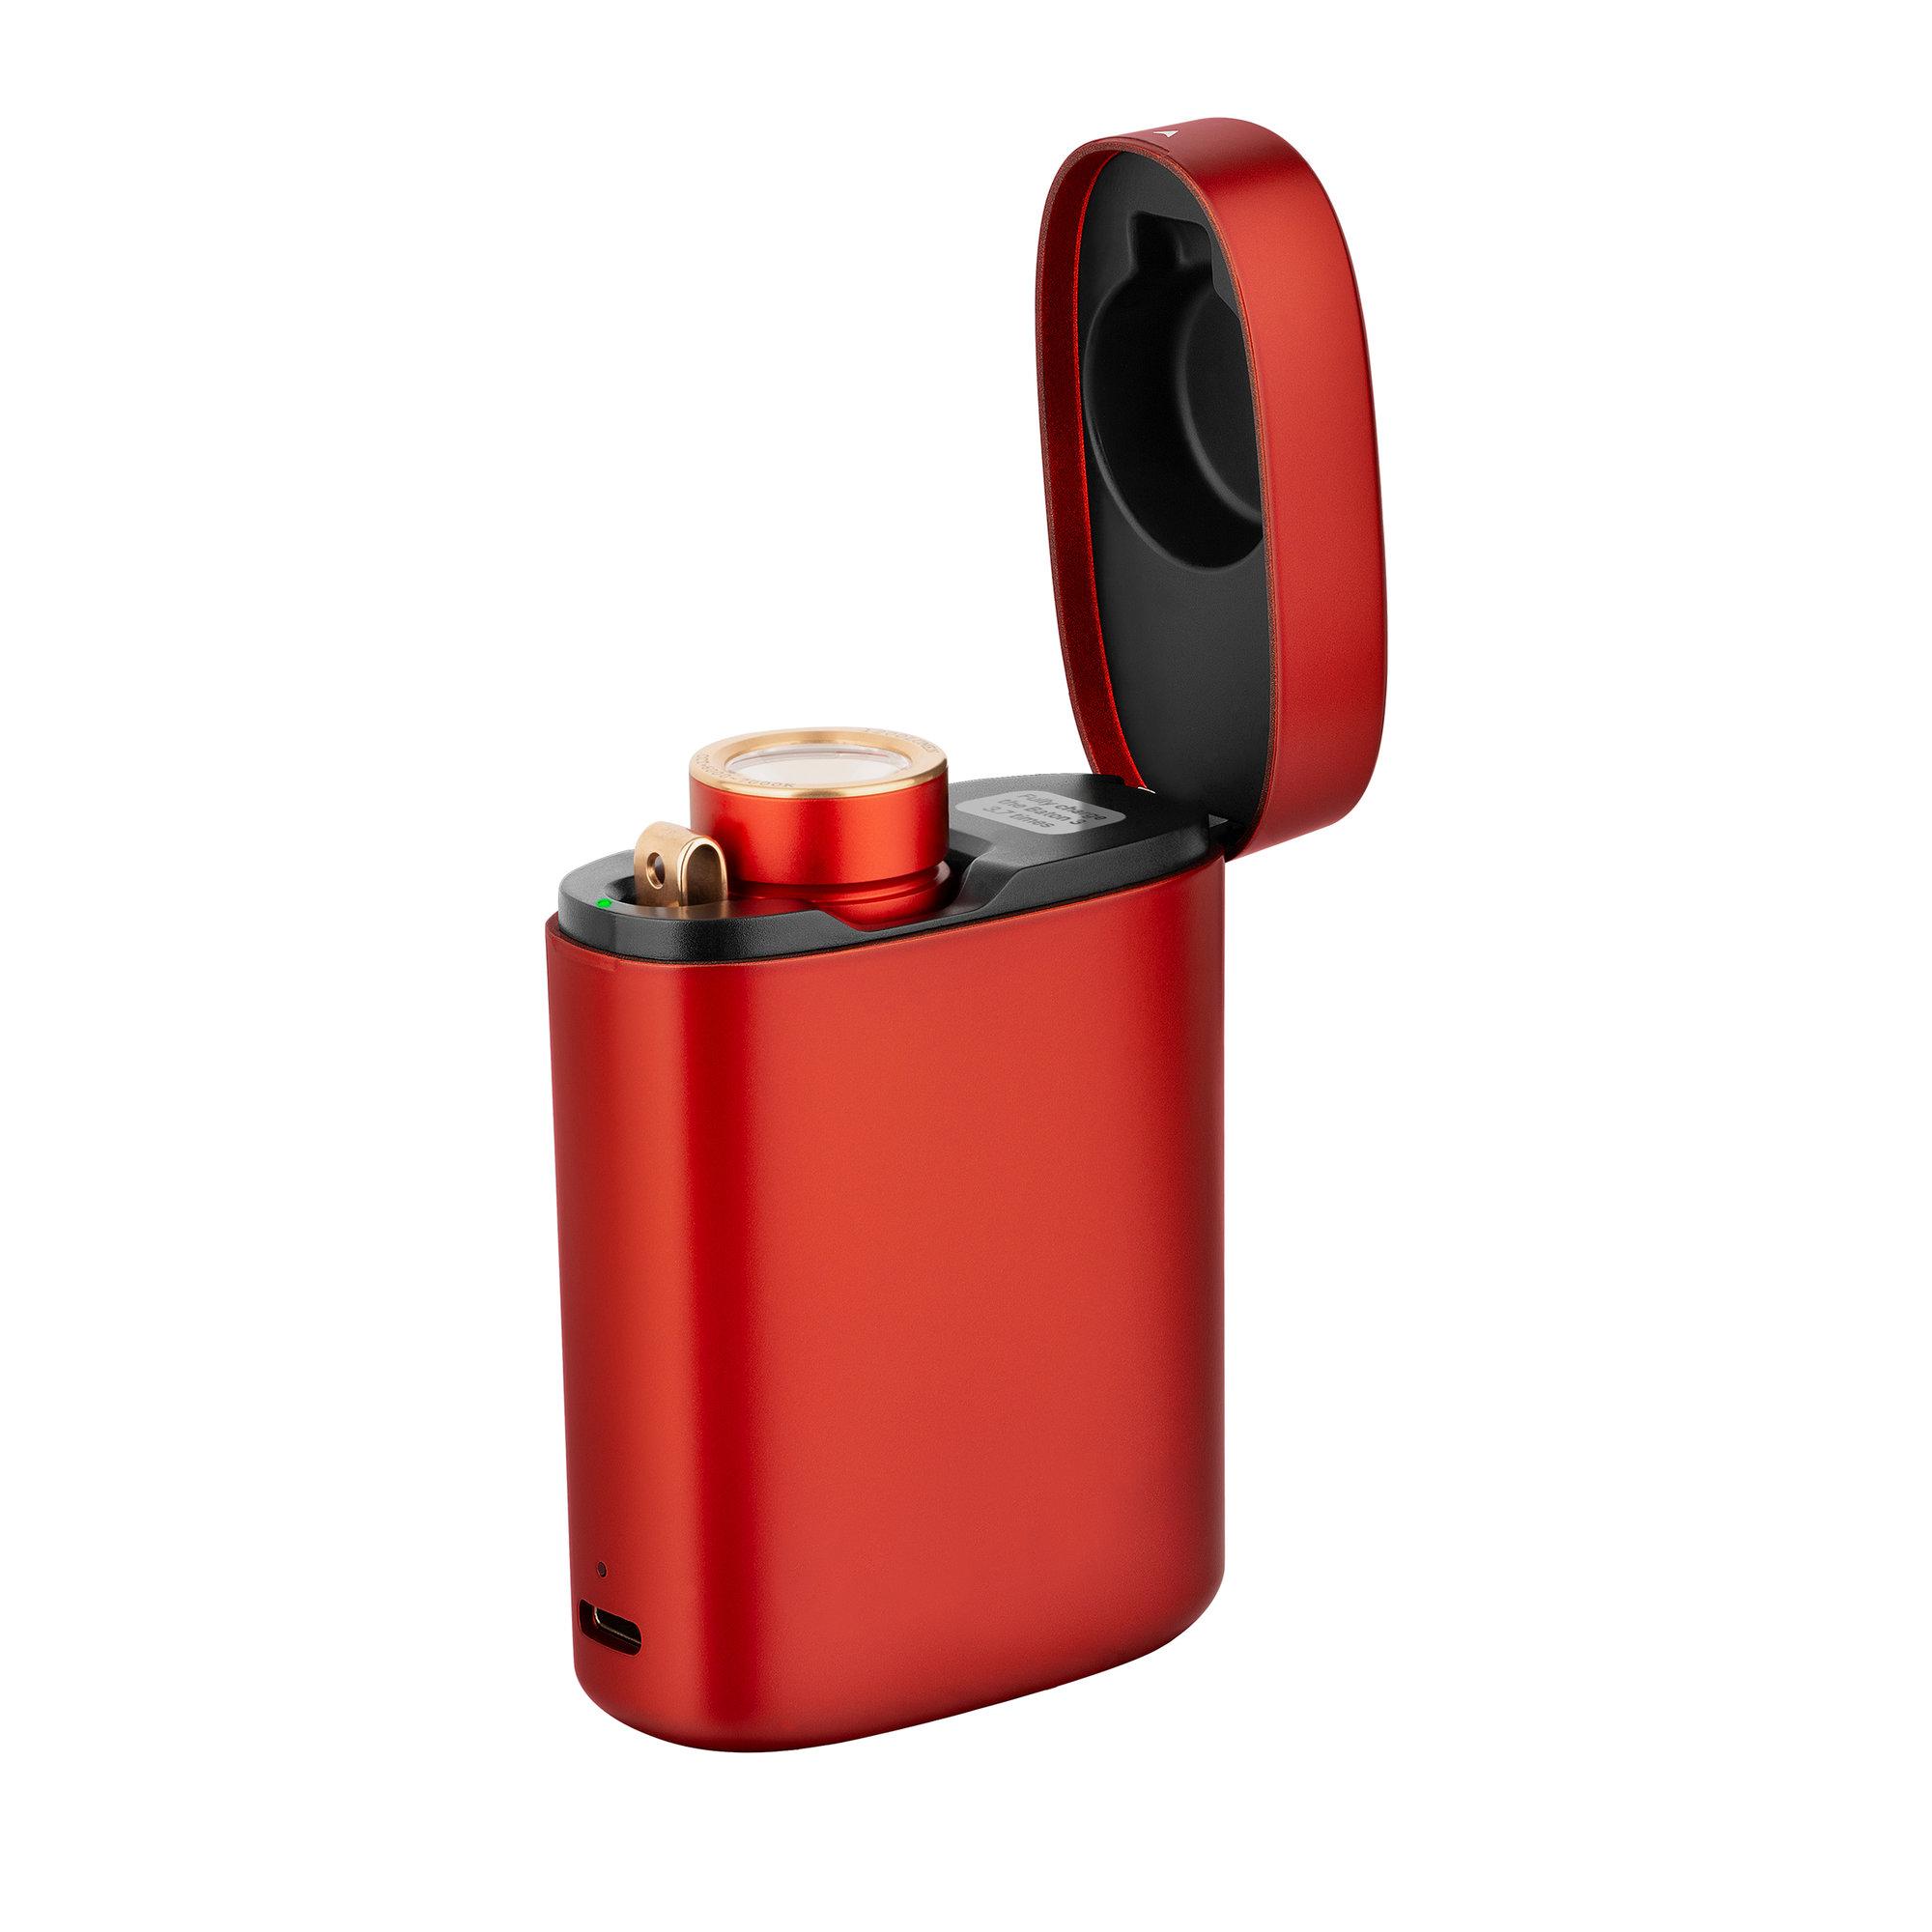 LED baterka Olight Baton 3 Red Premium Edition 1200 lm - limitovaná edícia